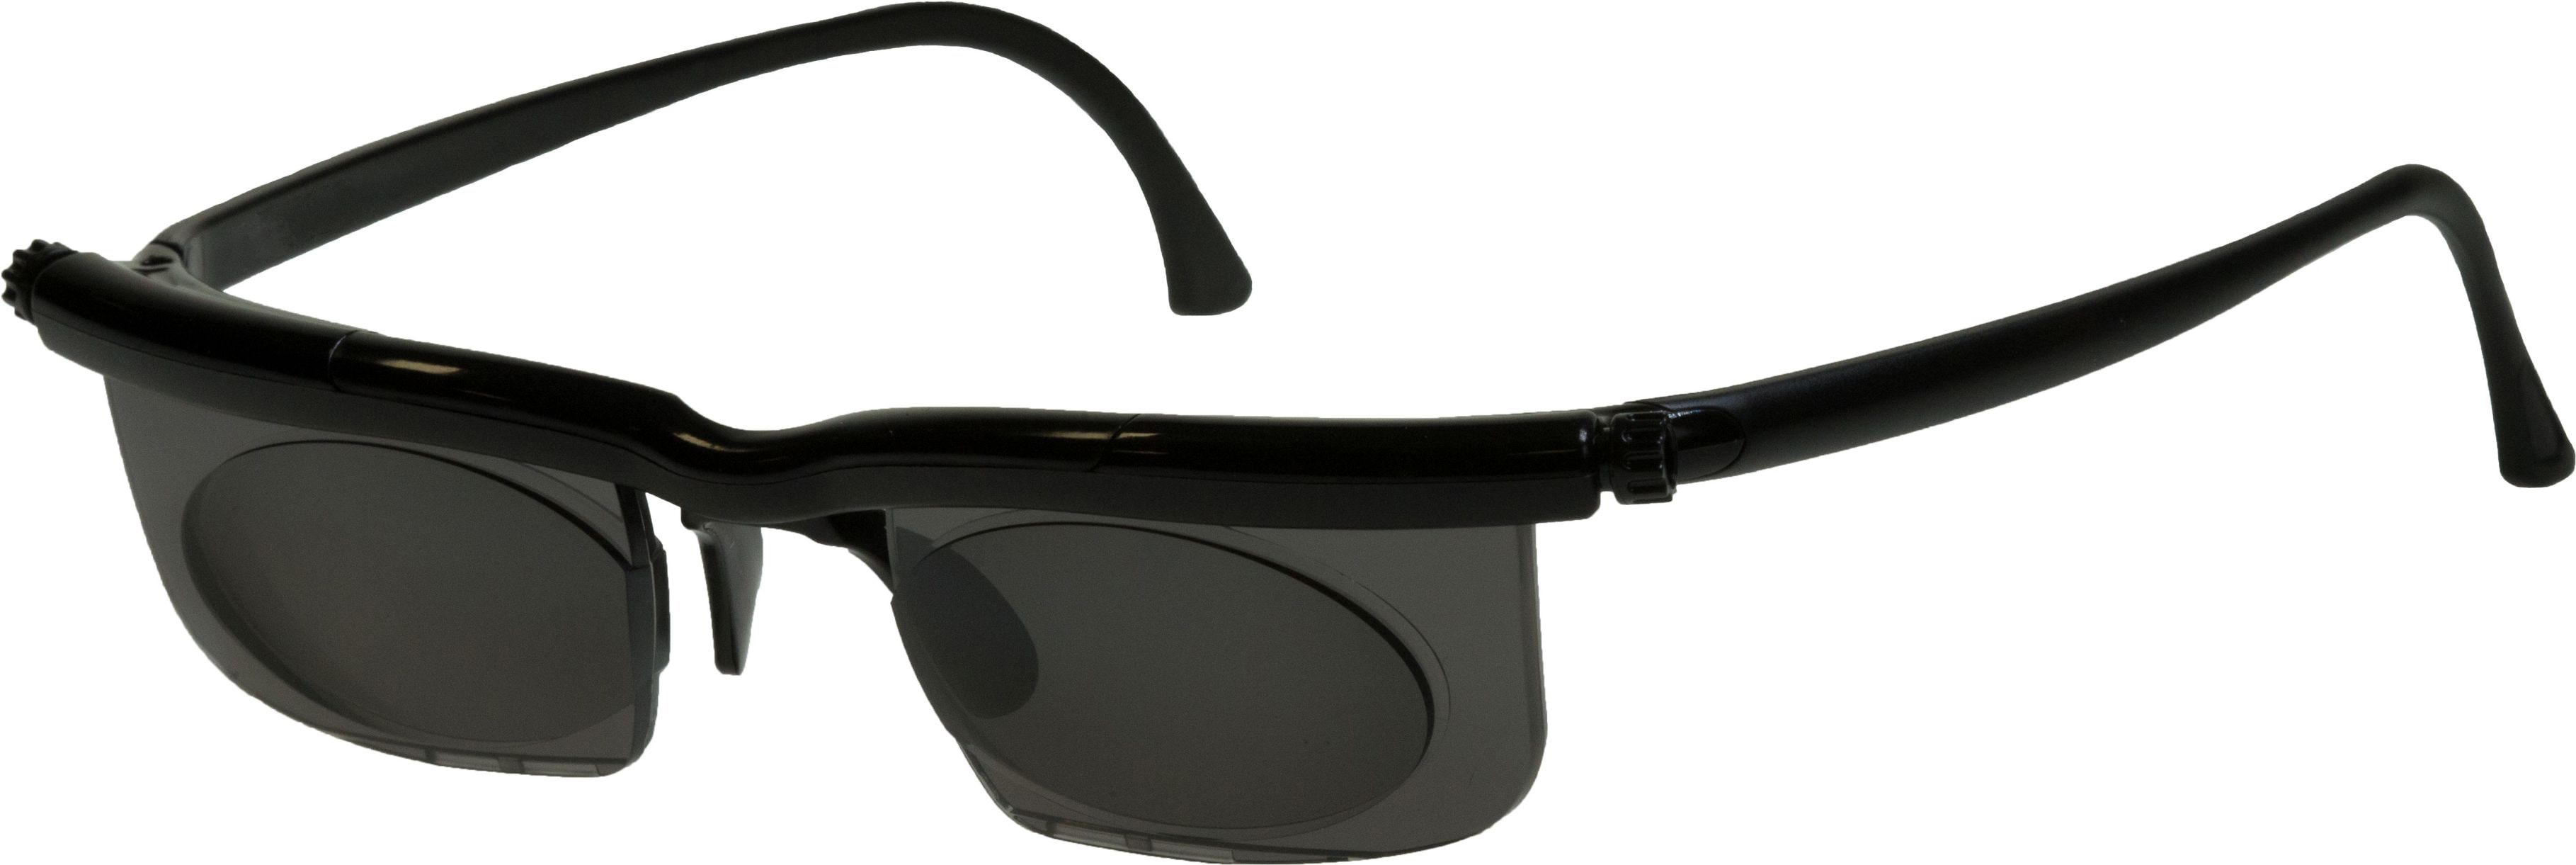 Image of Maximex Sonnenbrille »Adlens®«